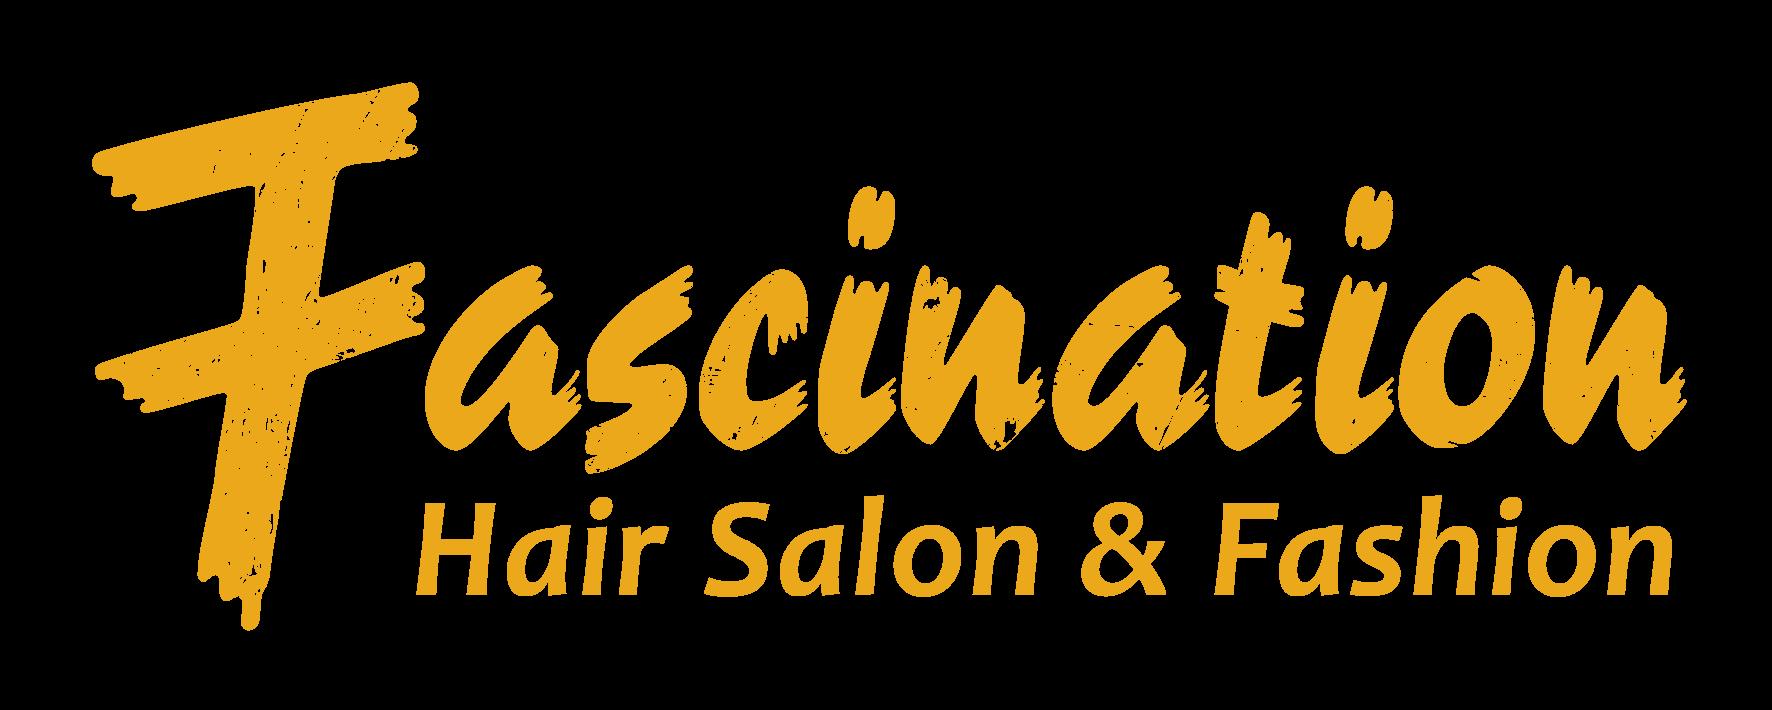 Fascination Haircuts